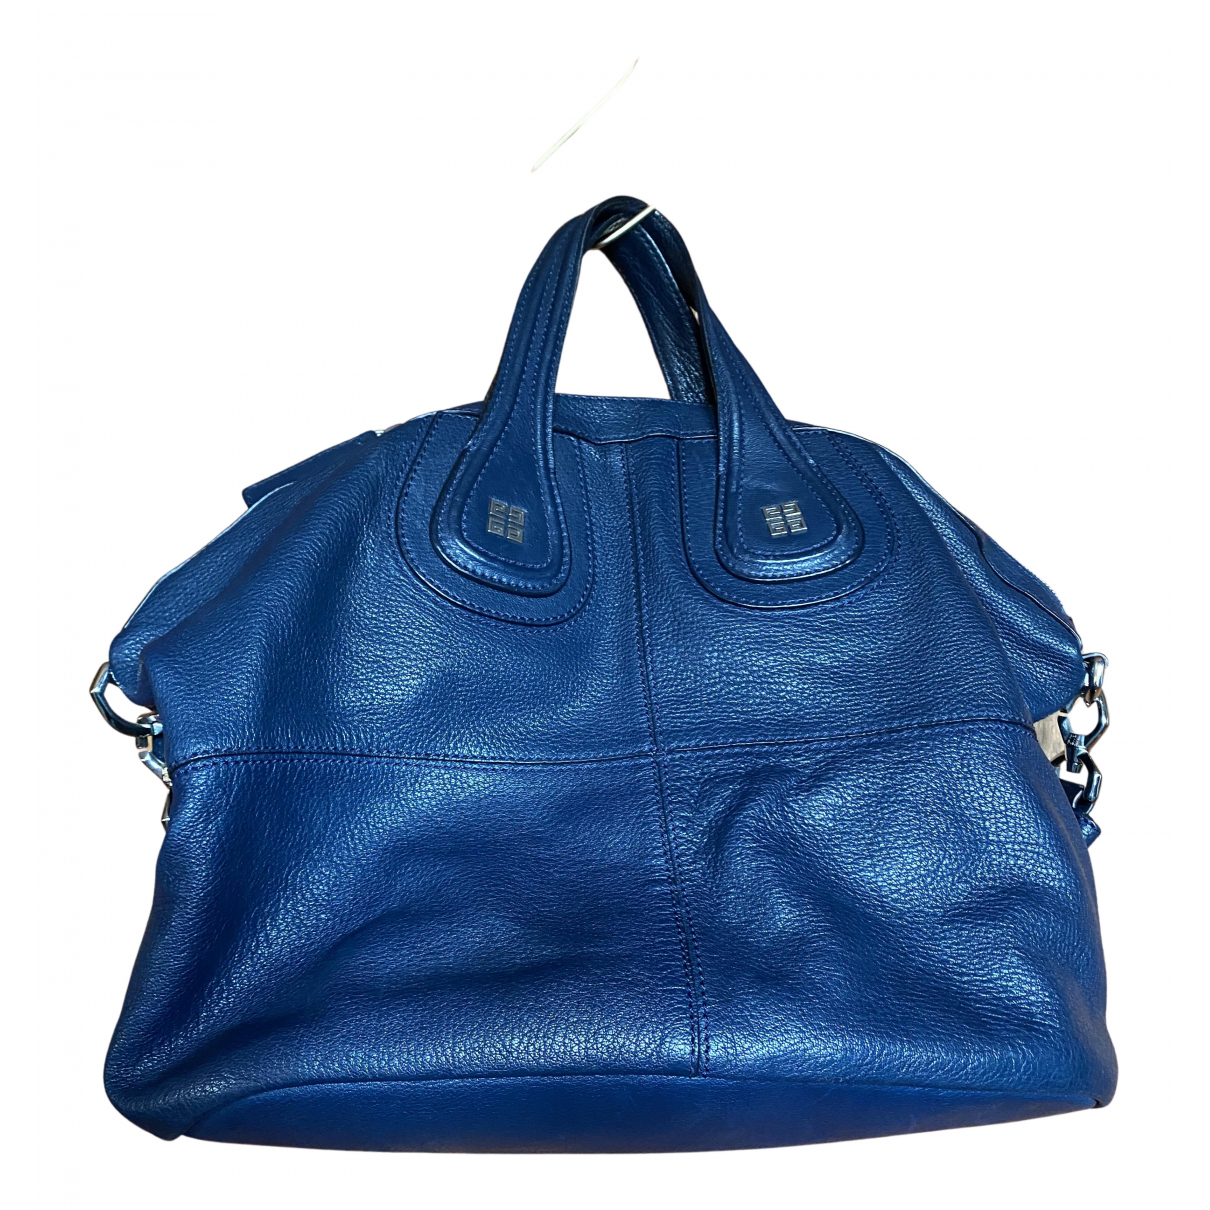 Givenchy Nightingale Handtasche in  Blau Leder